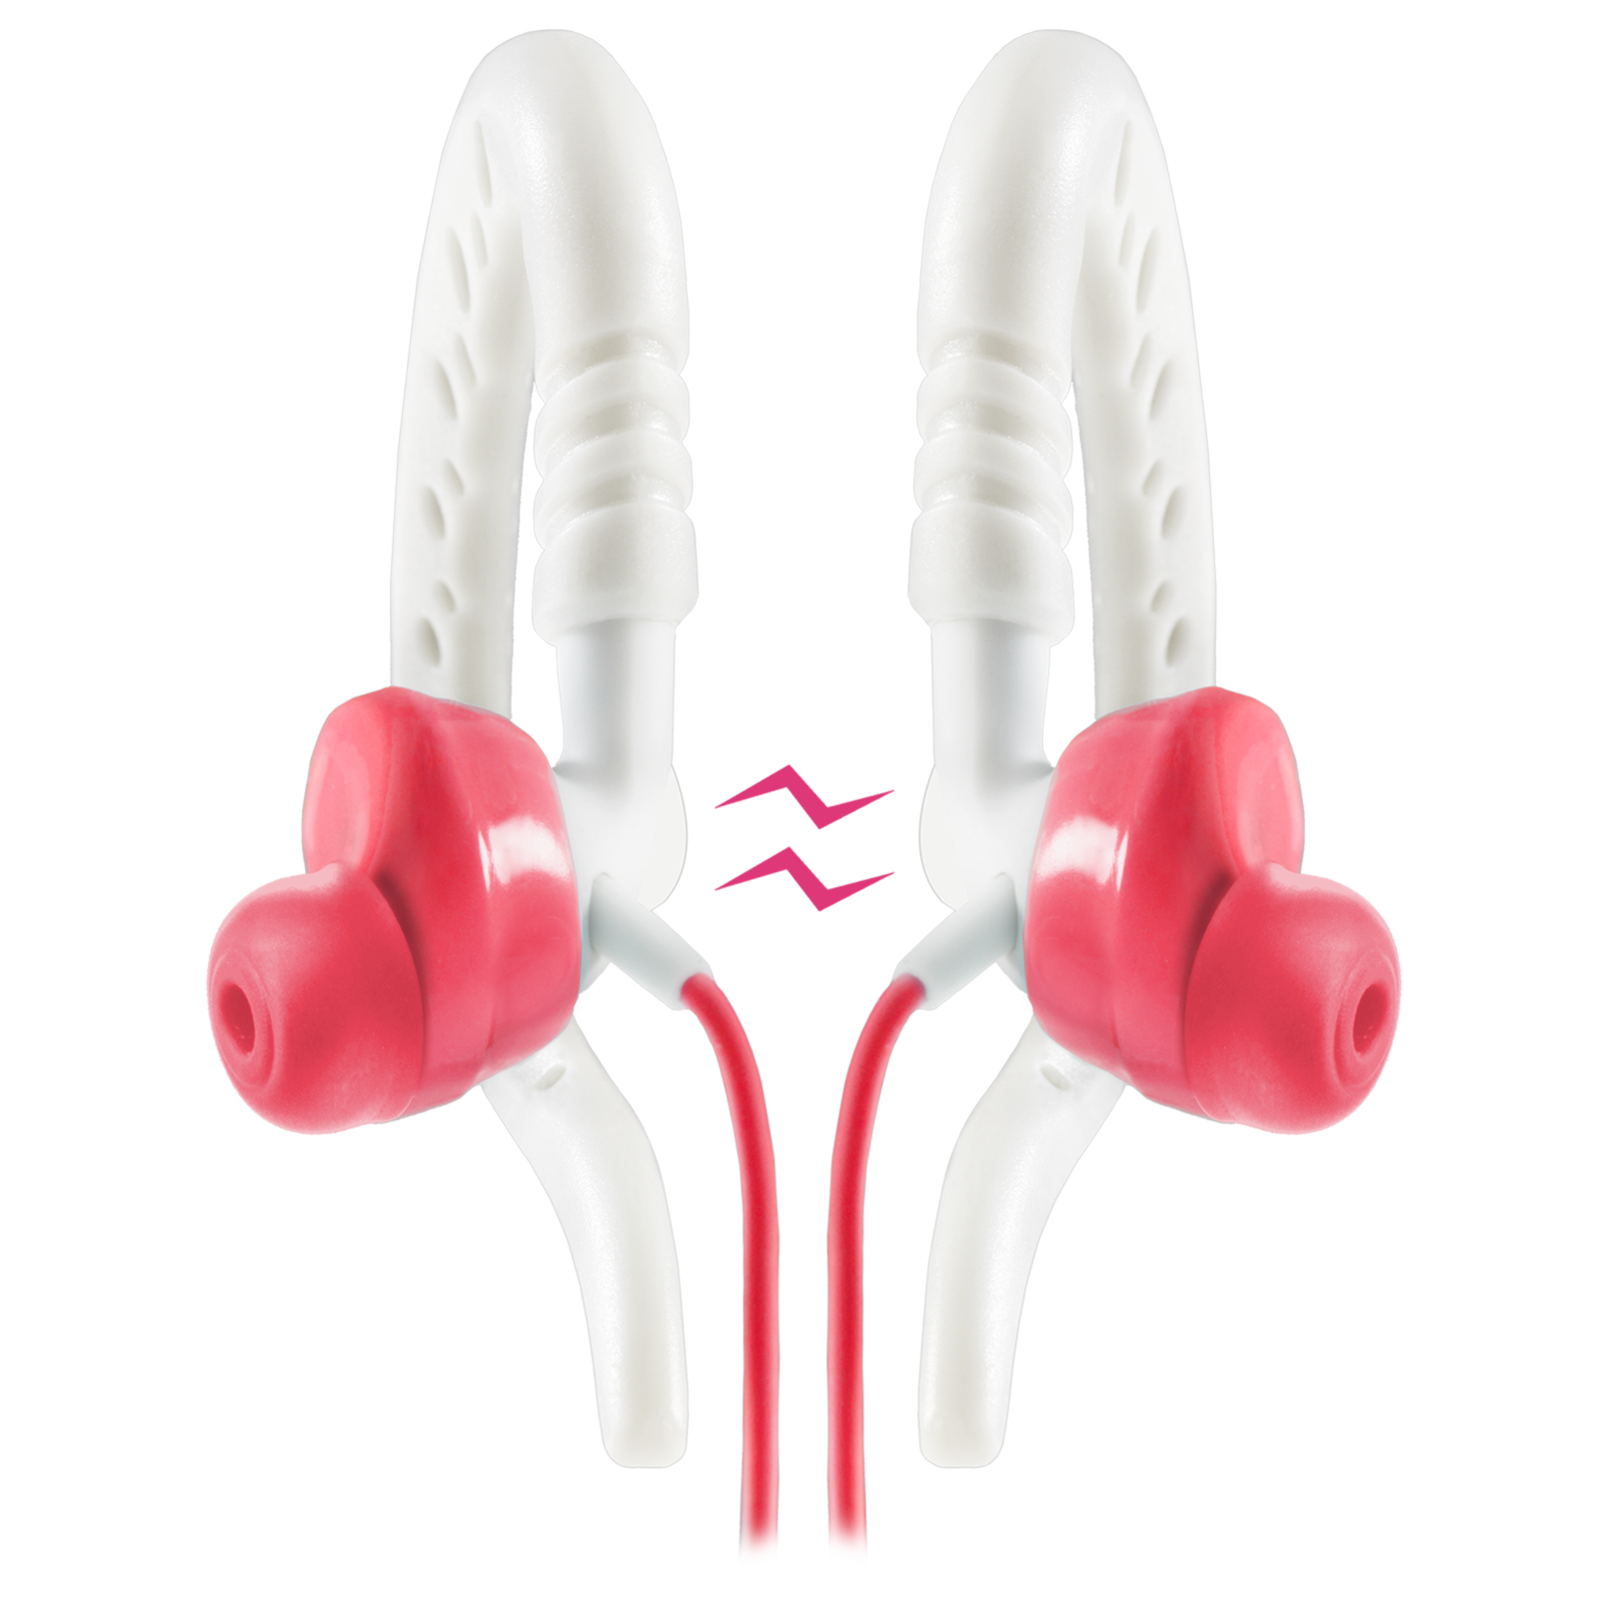 1d2f9ec1fb3 Focus® 400 For Women   Behind-the-ear, sport earphones are ...